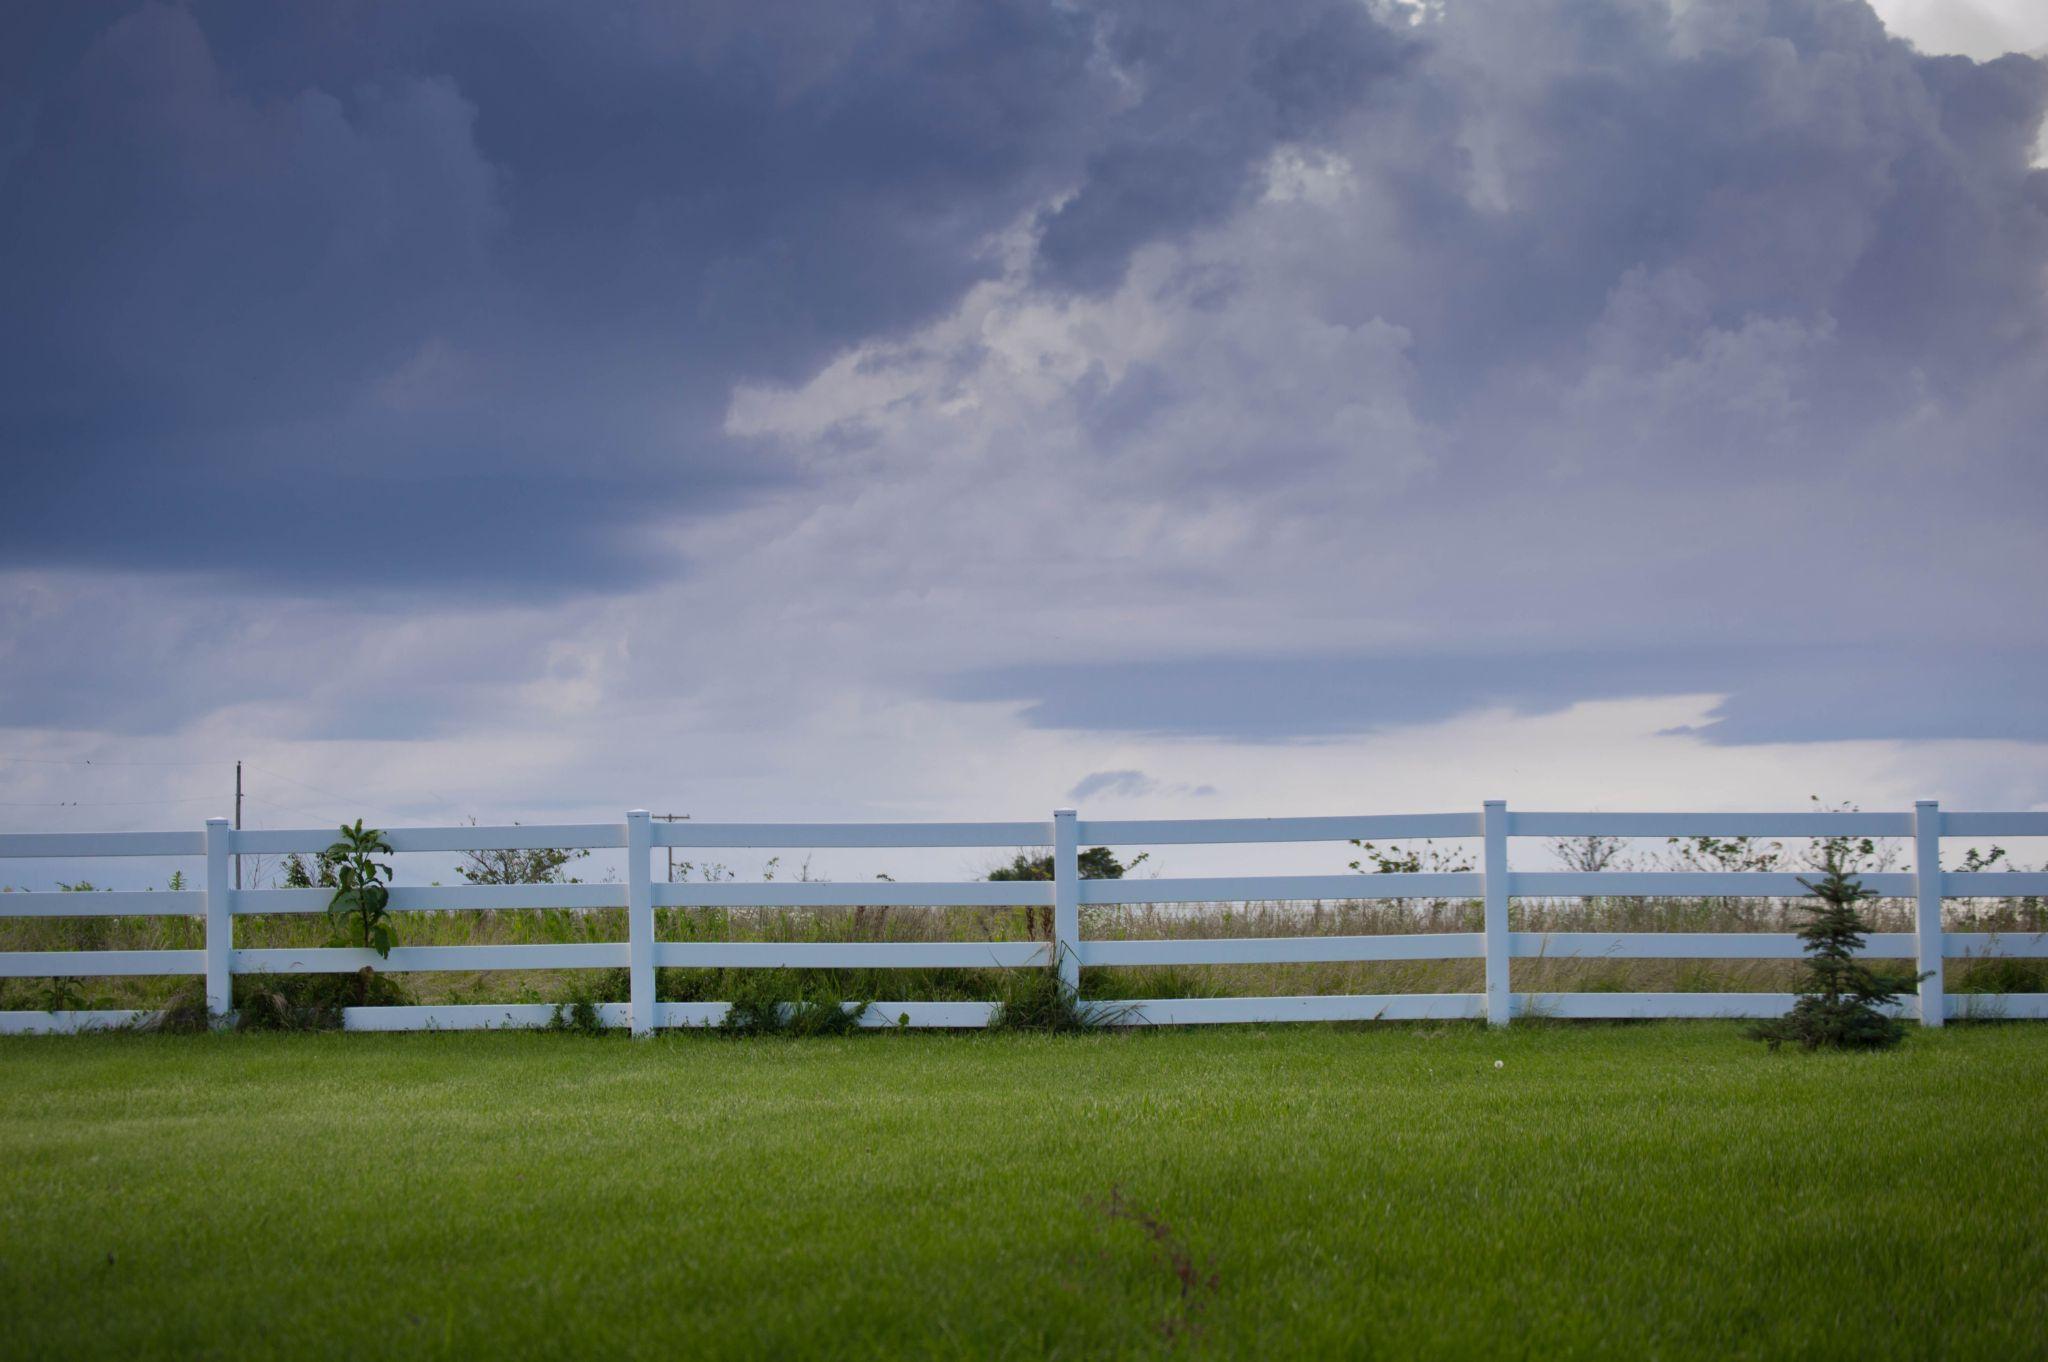 Missouri Landscape by BrookeMartin